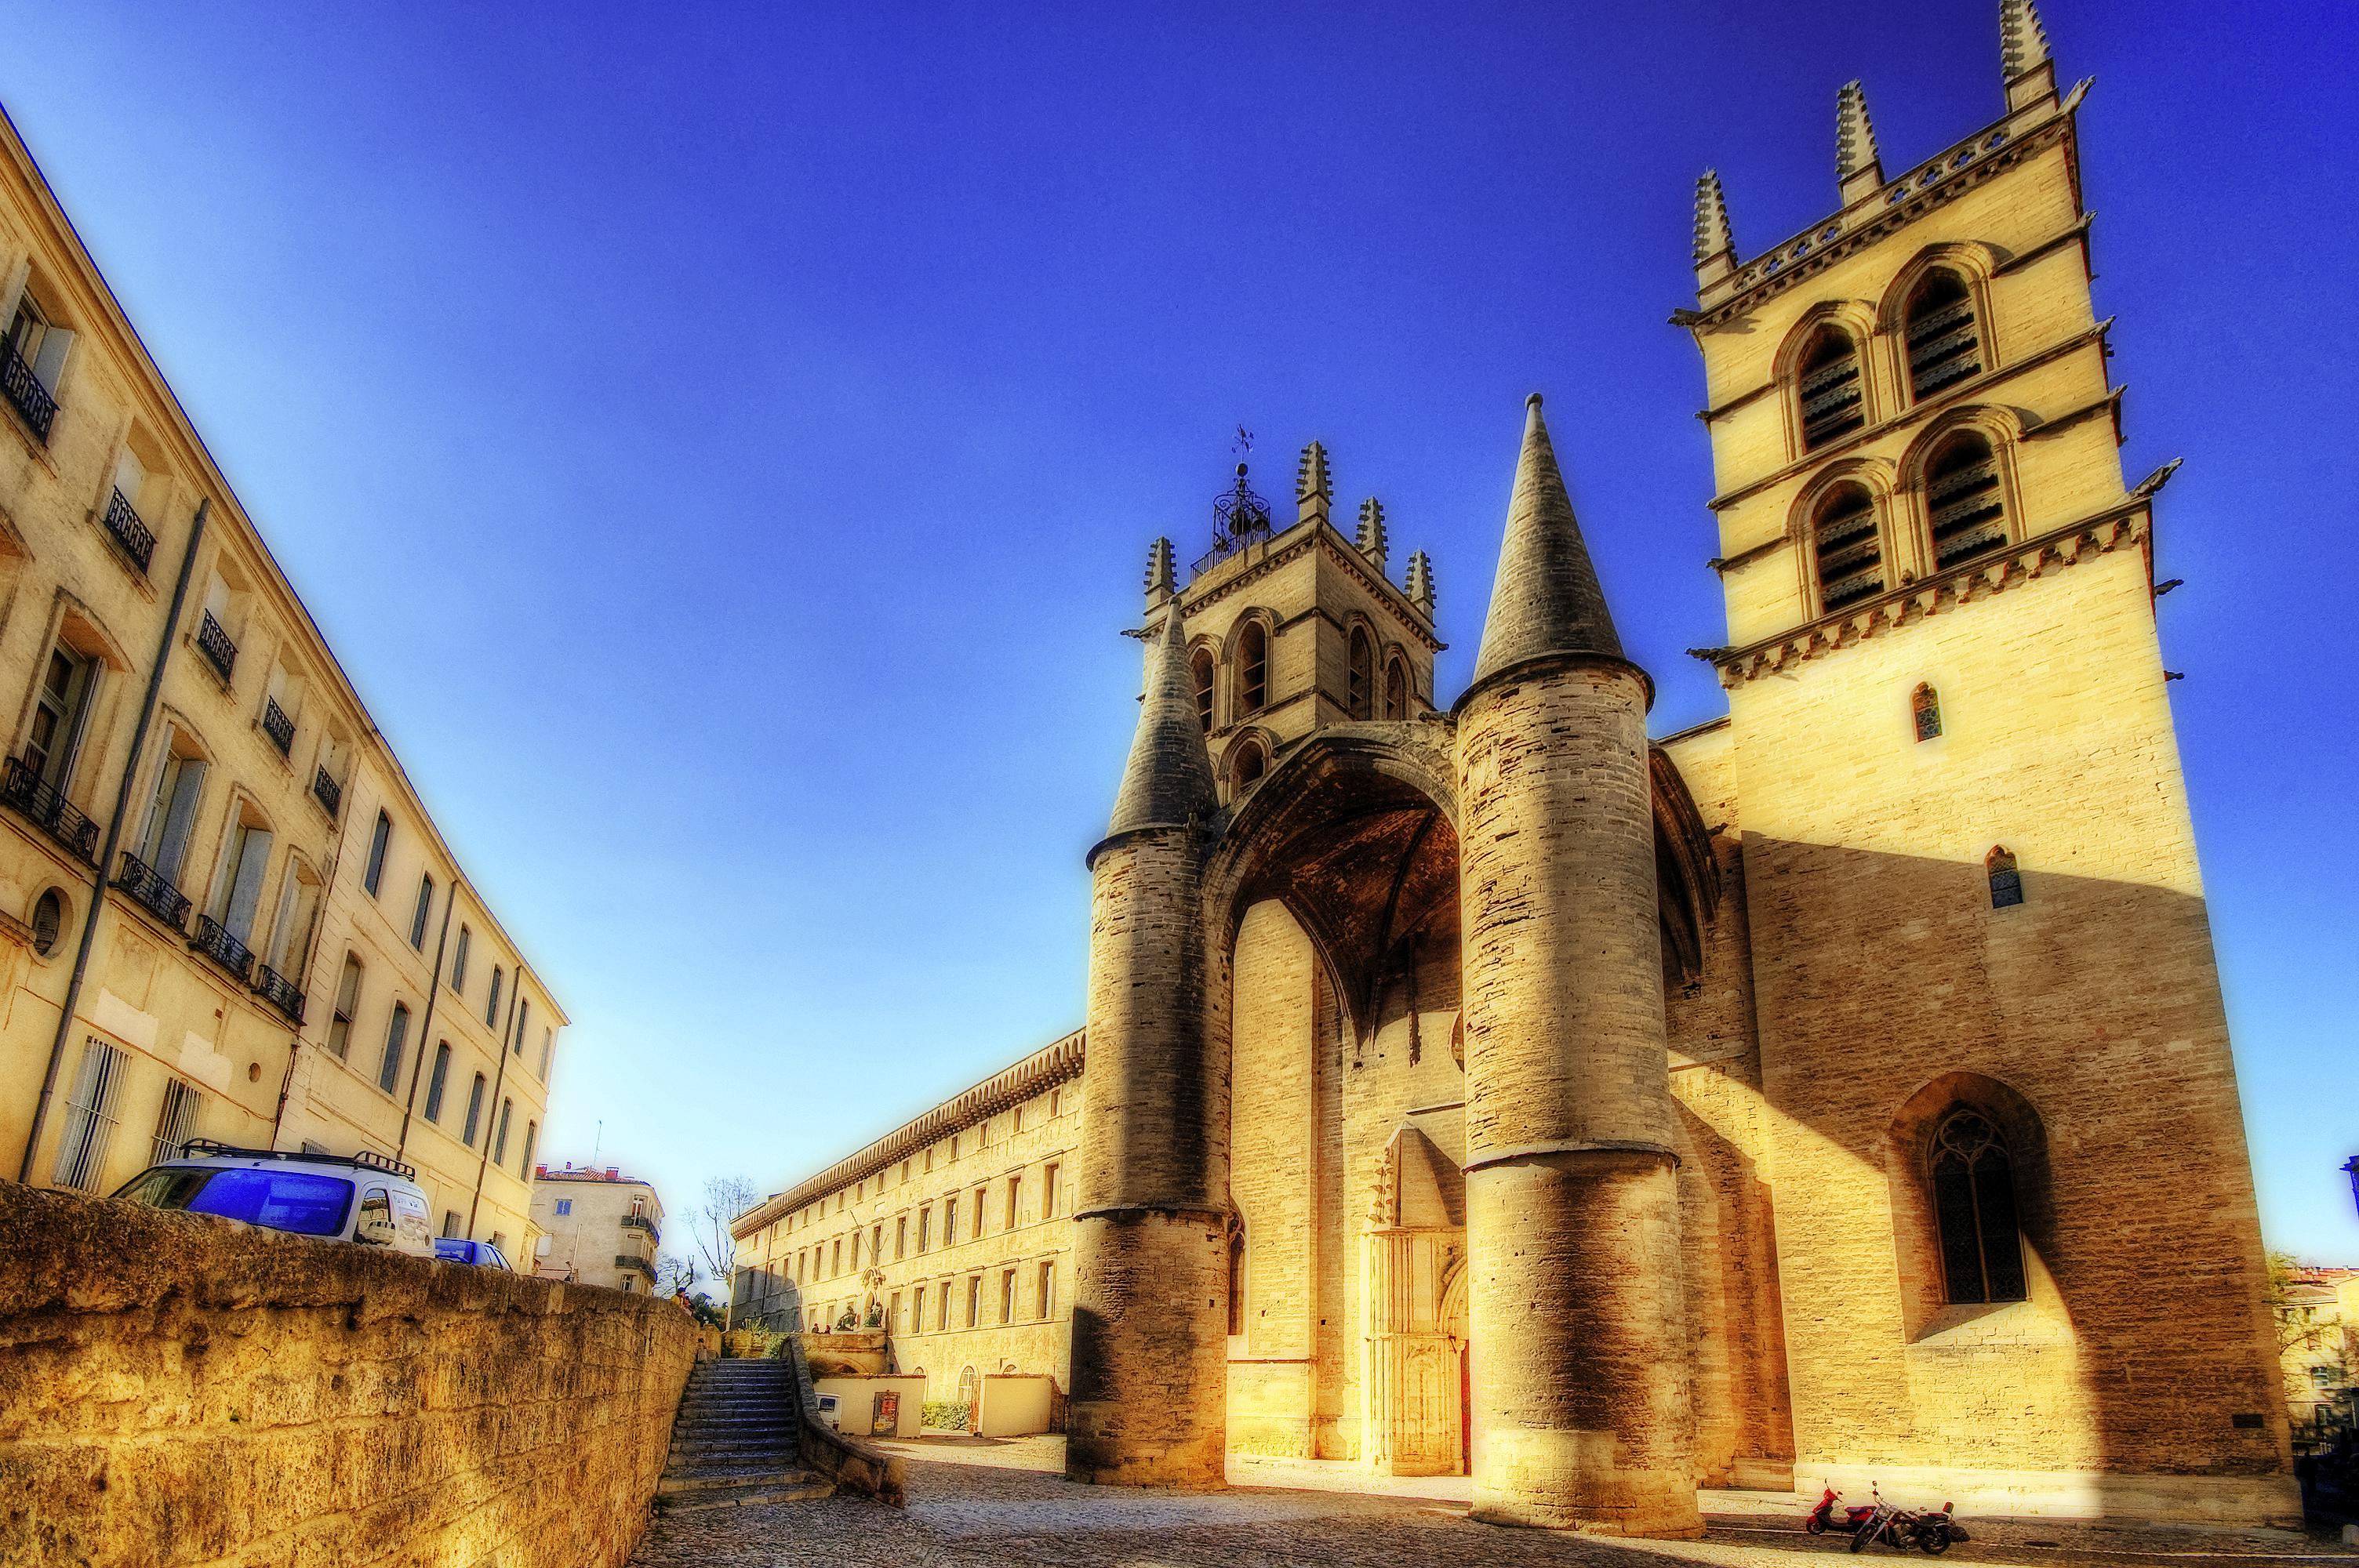 Montpellier cathedral - Cathedrale saint pierre de montpellier ...